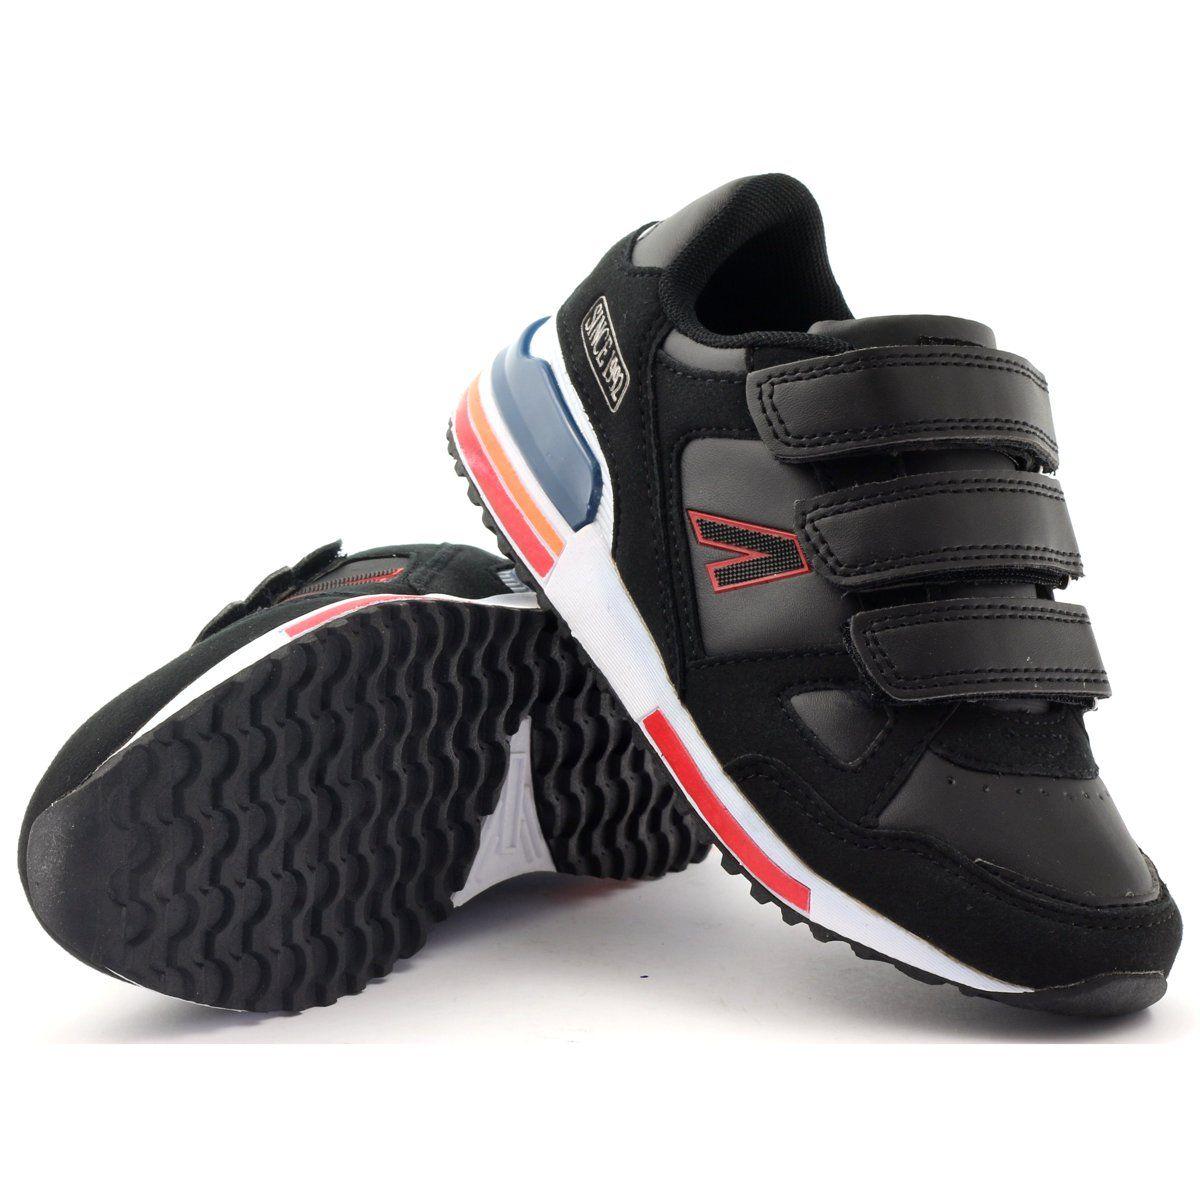 American Club Buty Sportowe Na Rzepy American 4594 Czarne Czerwone Biale Fisherman Sandal Shoes Dc Sneaker